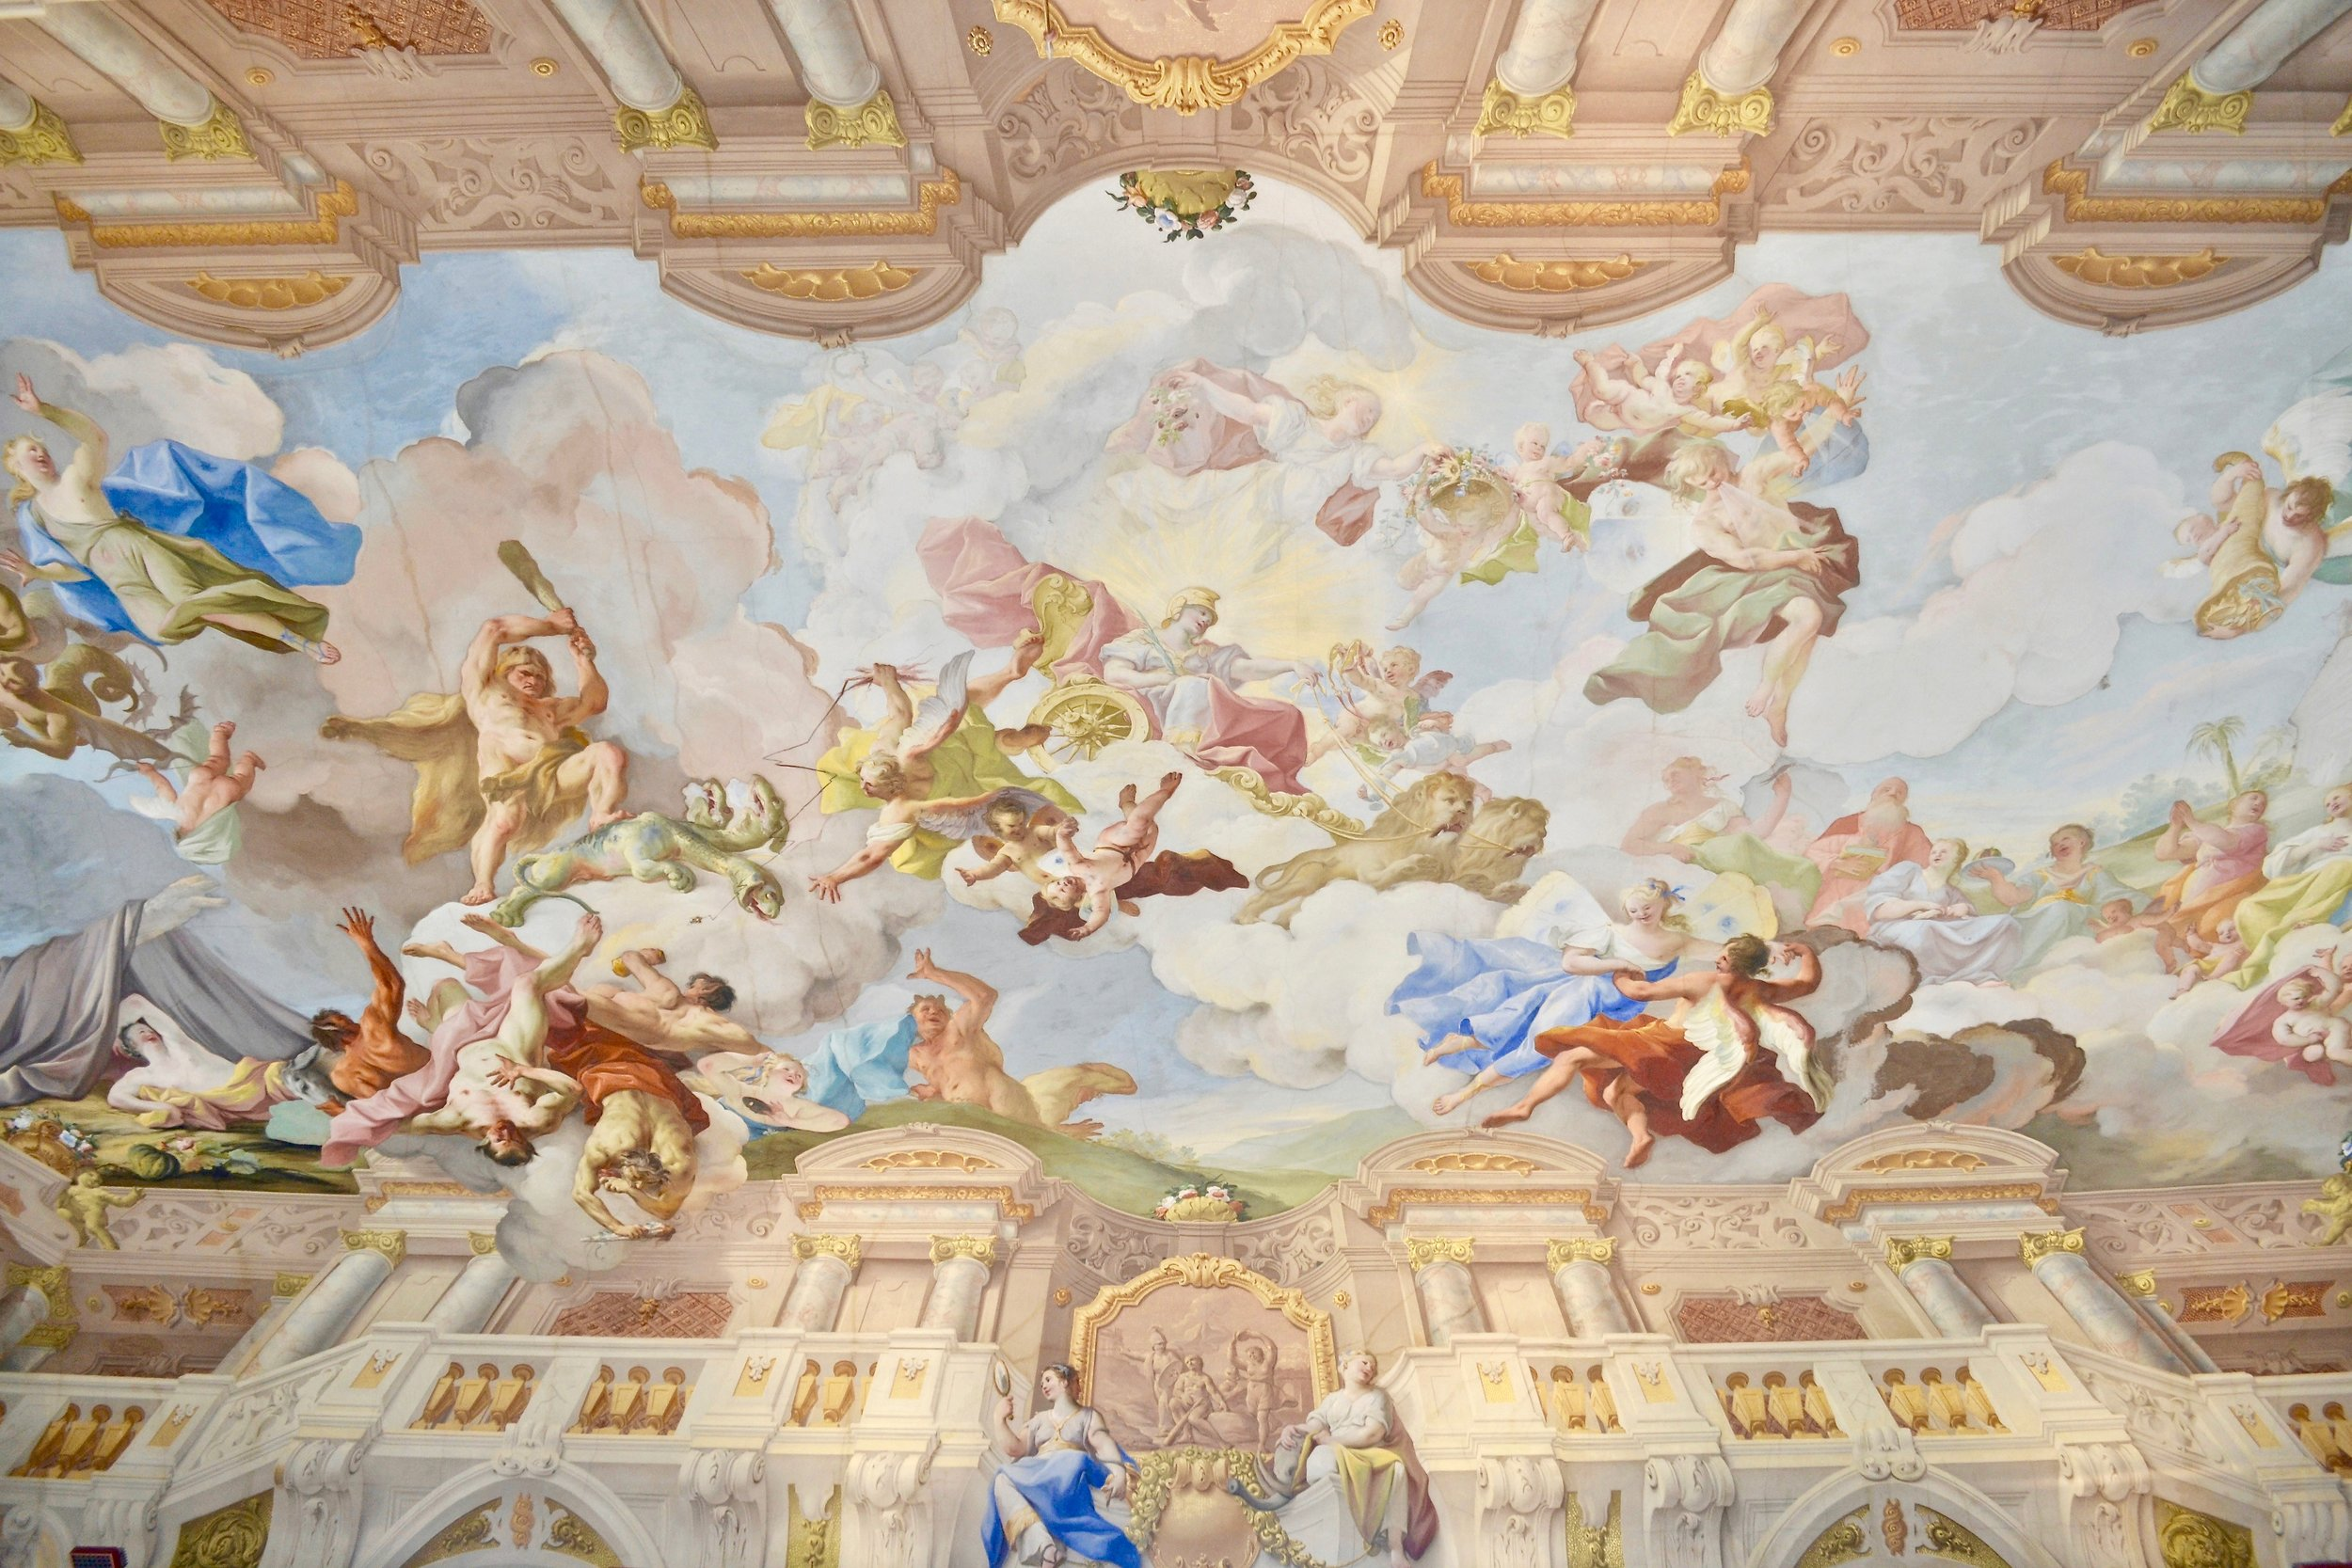 Marble Hall Ceiling Fresco